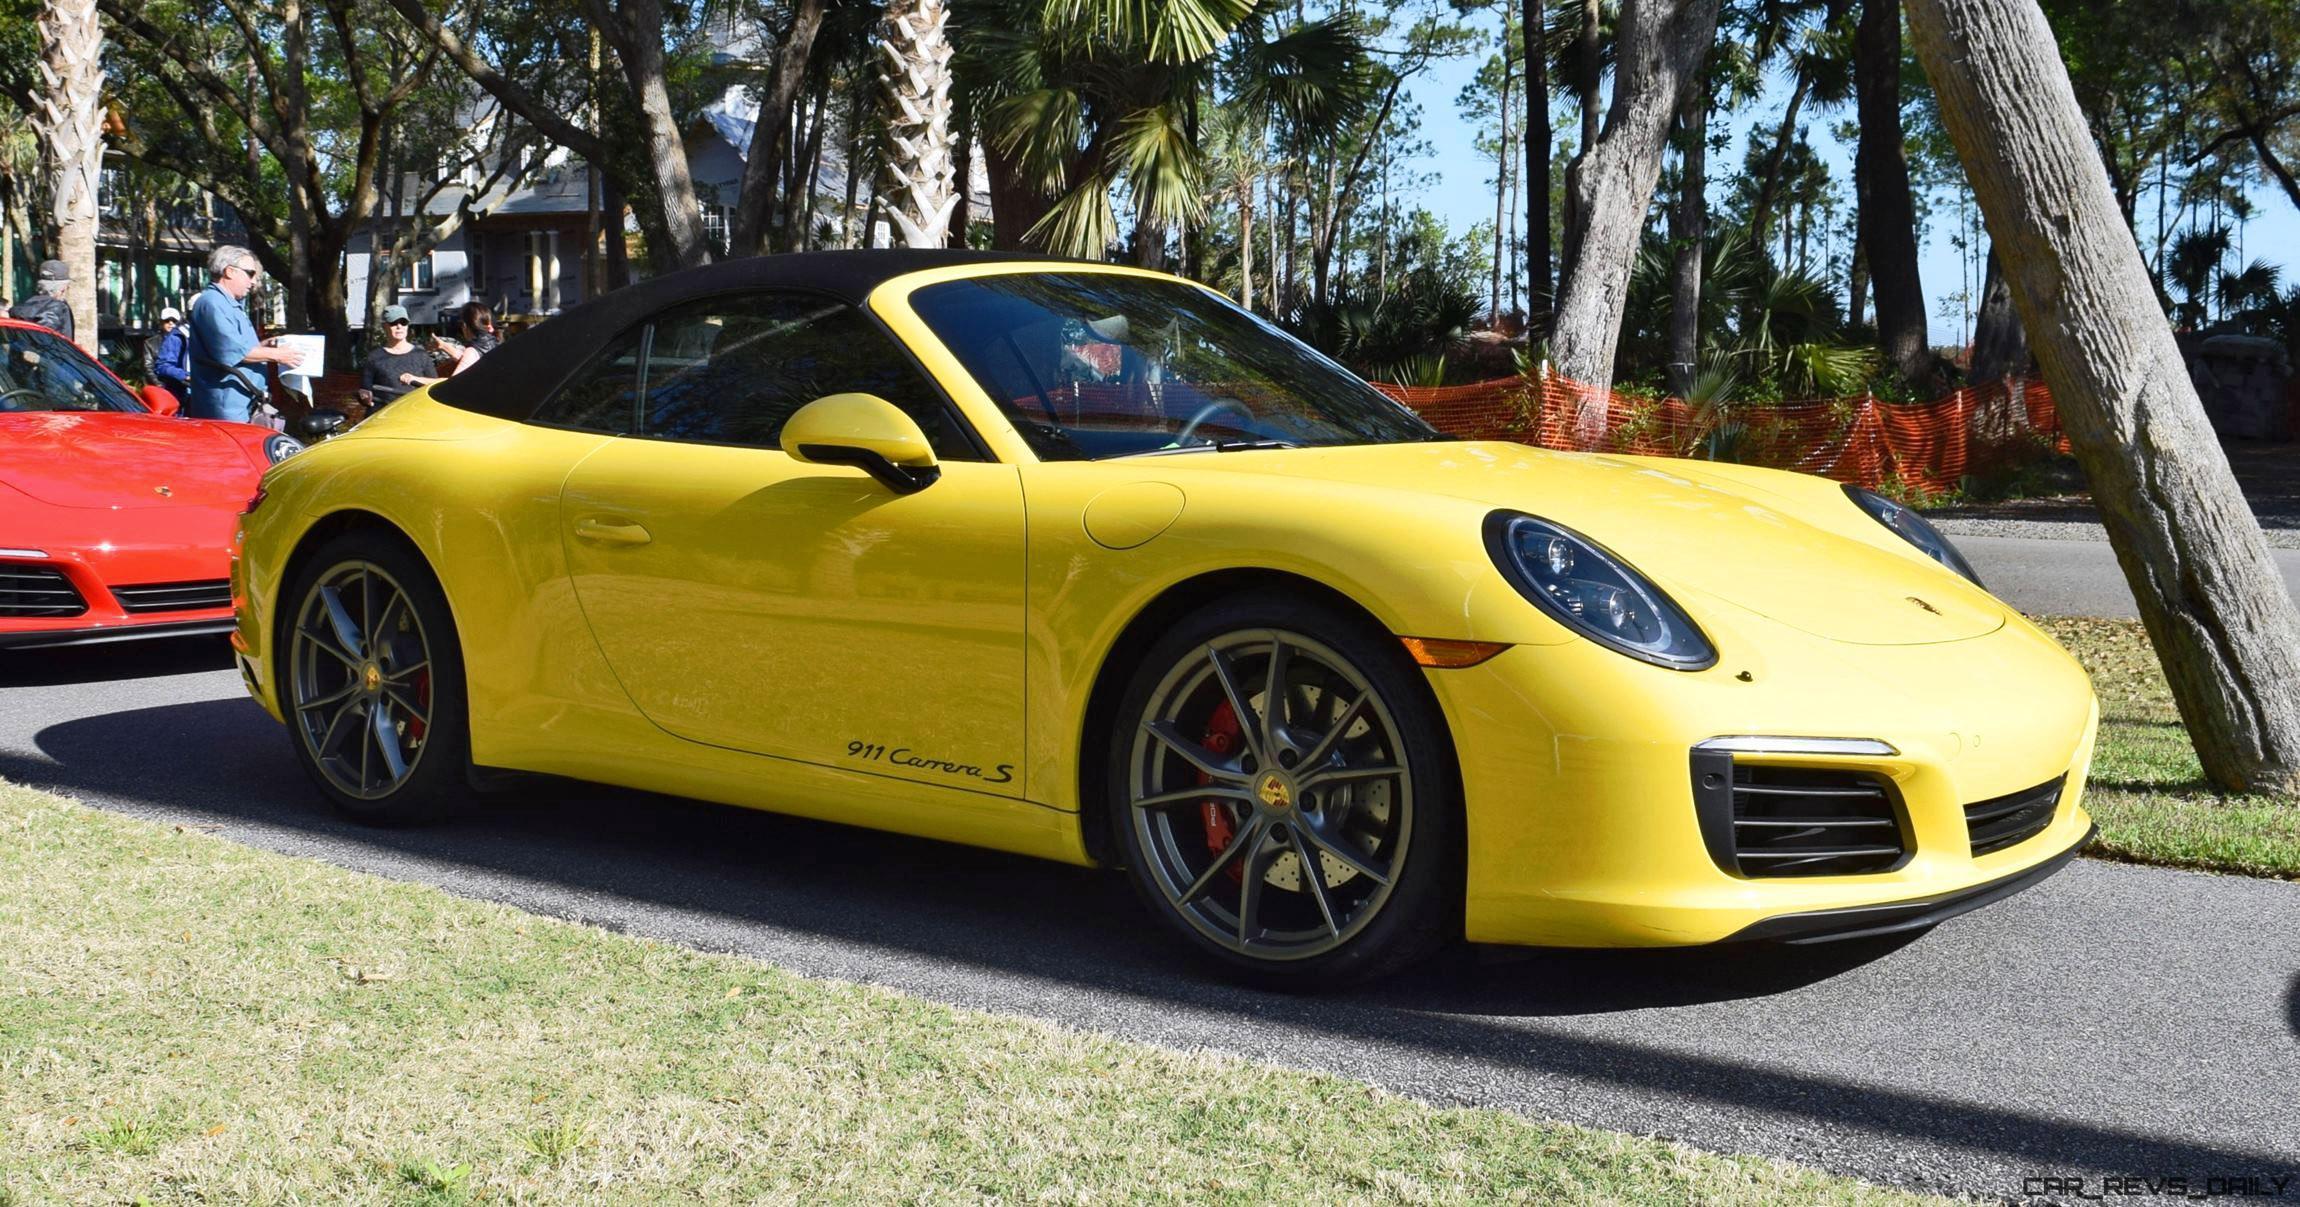 2017 porsche 911 carrera s race yellow 5. Black Bedroom Furniture Sets. Home Design Ideas